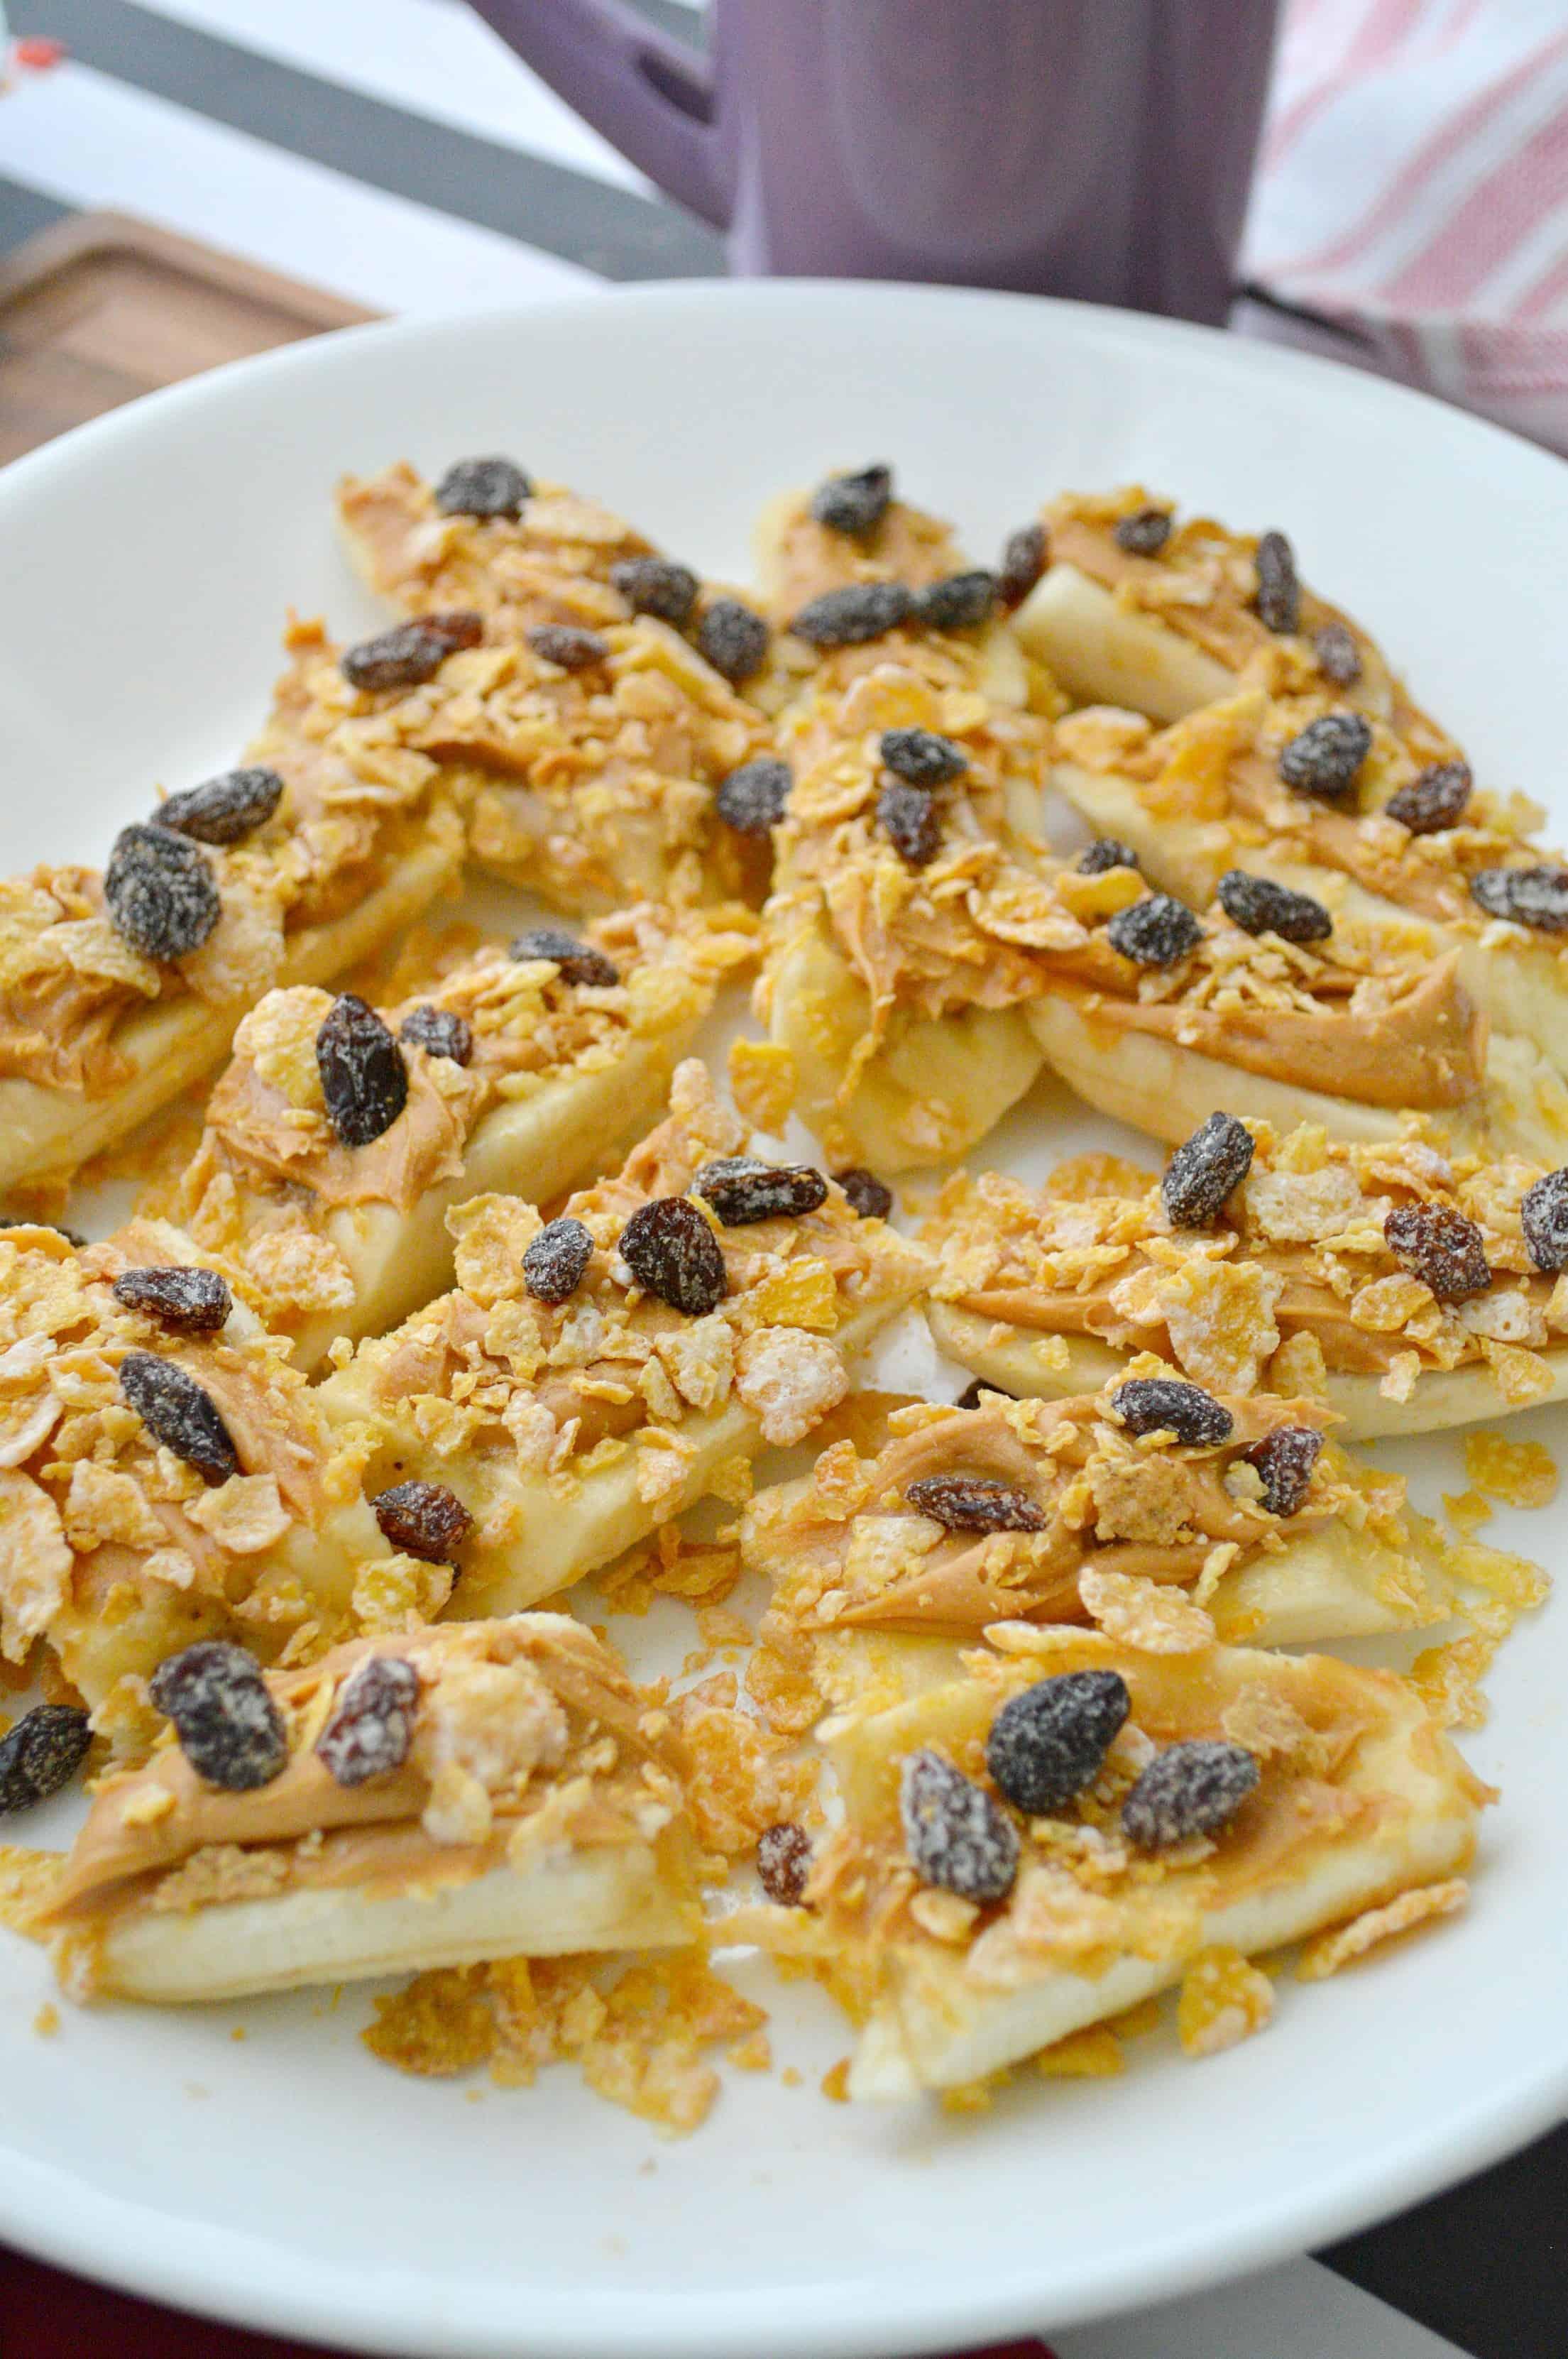 3 Ingredient Peanut Butter Banana Snack For Kids